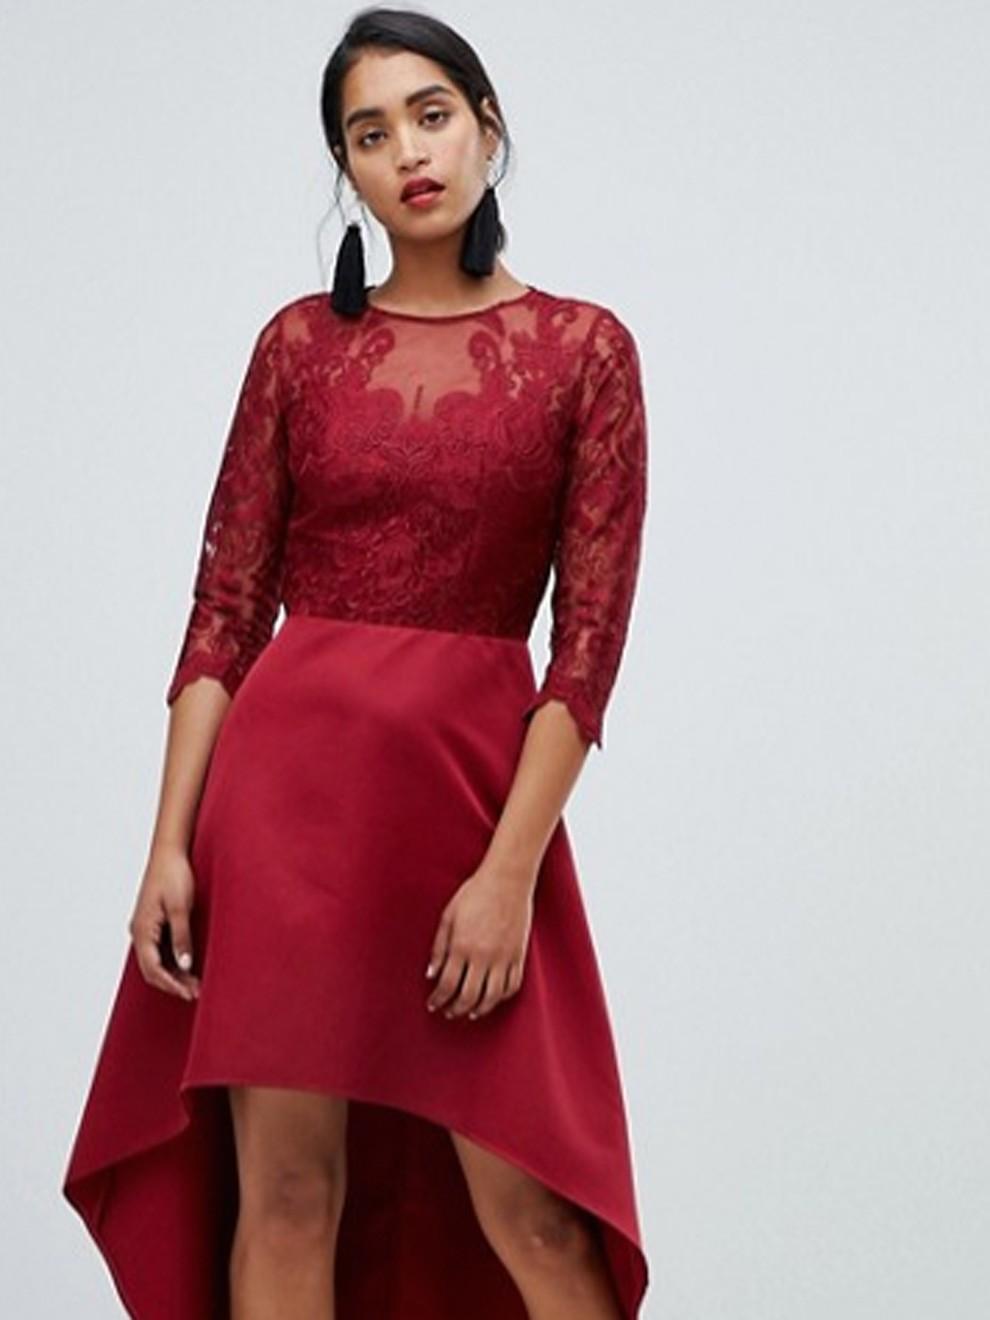 Vestido asimétrico rojo de Asos por 96'99 euros